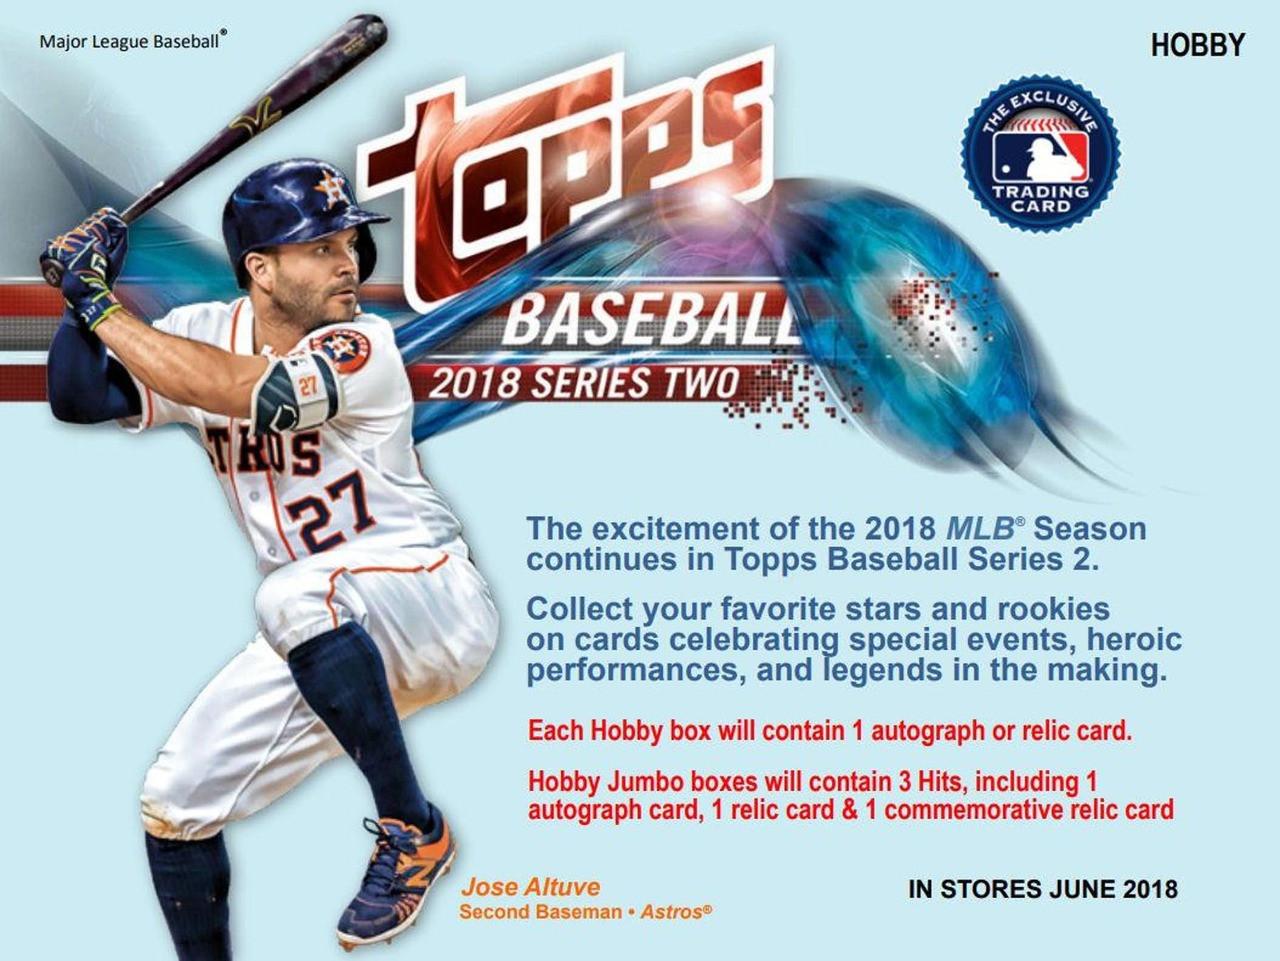 2018 Topps Series 2 Baseball Jumbo Hta Box 2 Silver Packs